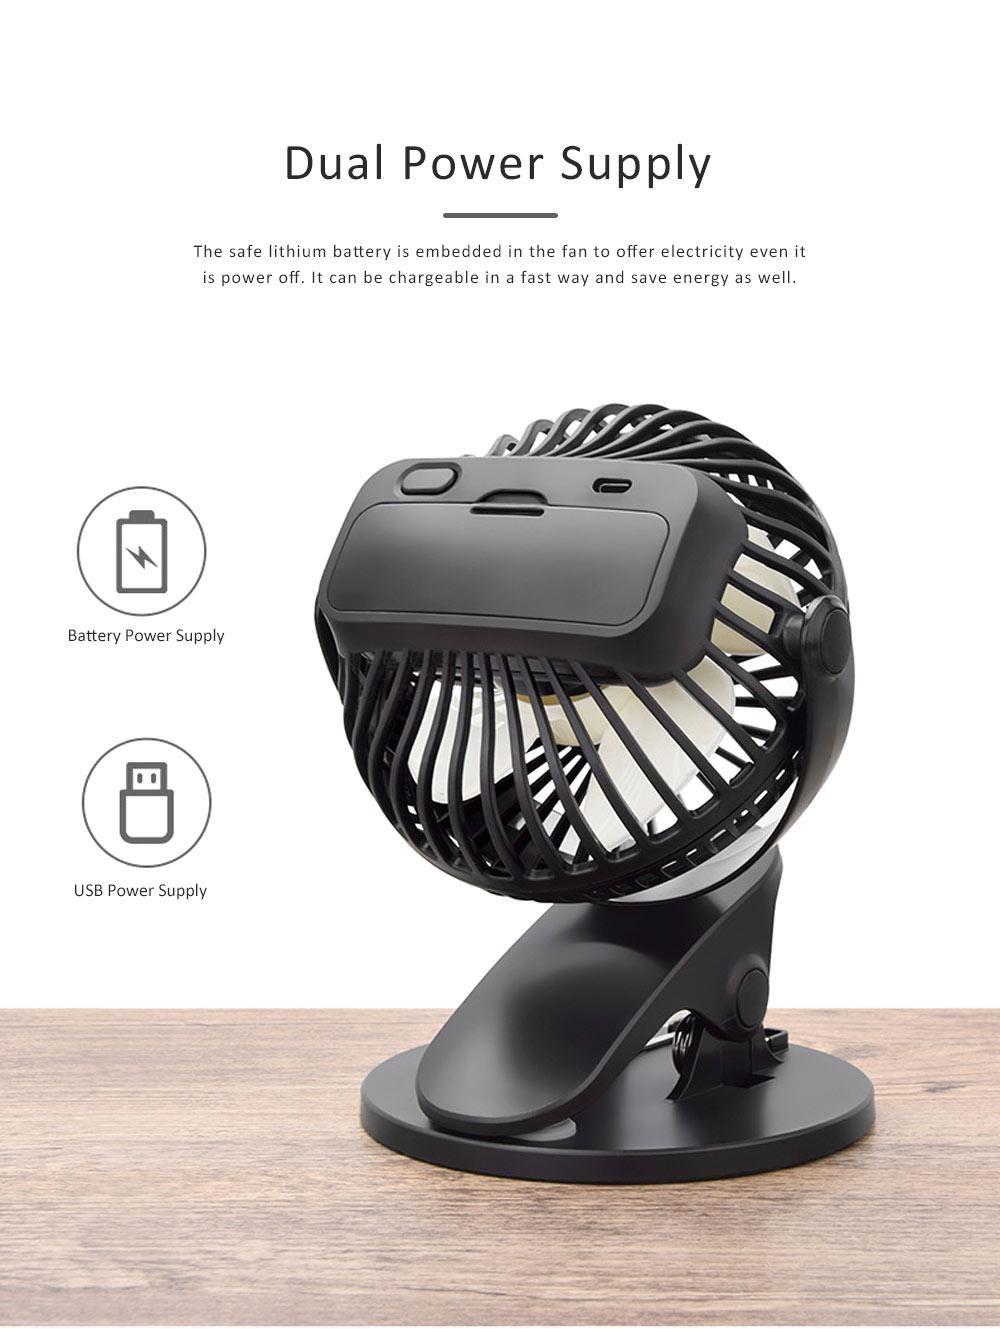 Vehicle-mounted Mini Fan,  Mini Fan USB with Durable Clip Cool Mini Fan for Summer Home, Car, Office 2